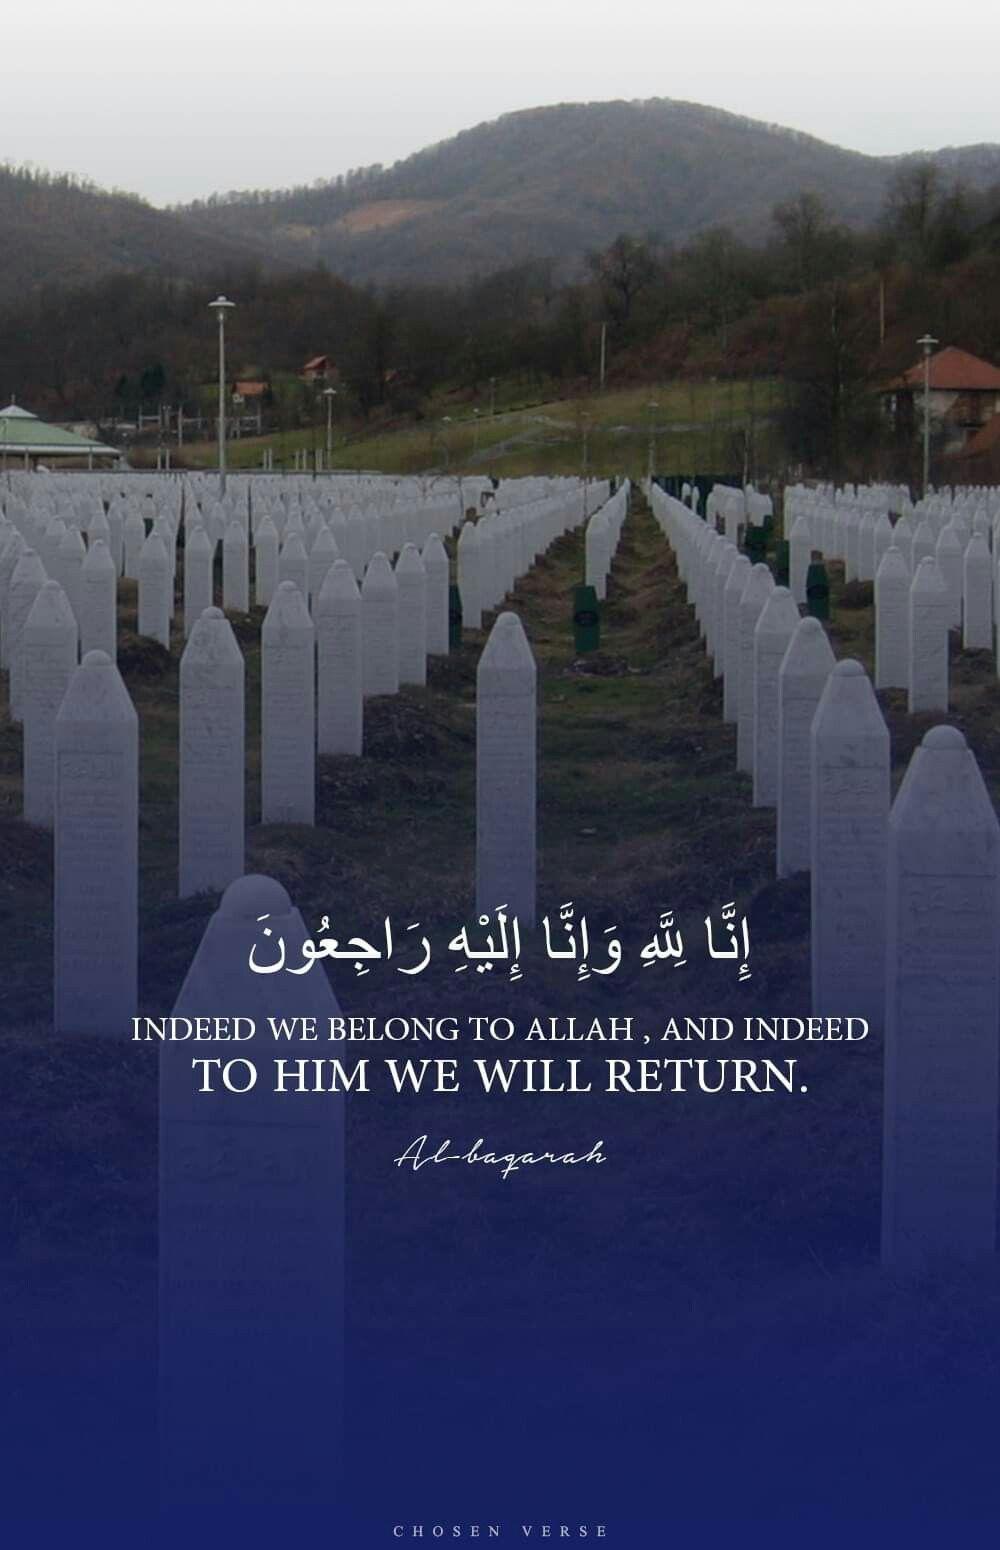 انا لله وانا اليه راجعون Beautiful Quran Quotes Quran Quotes Inspirational Islamic Pictures